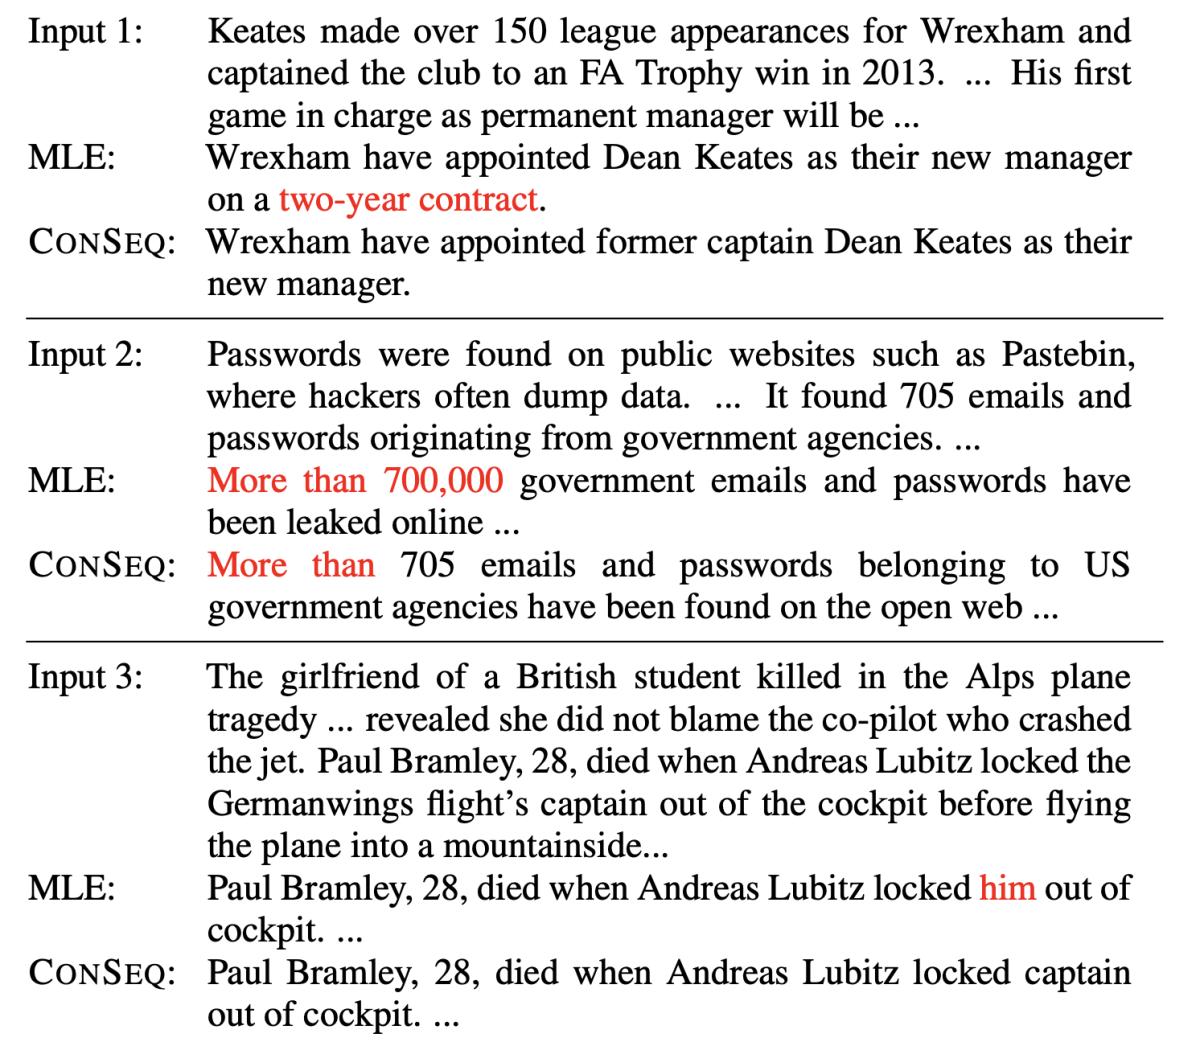 Sample summaries.png